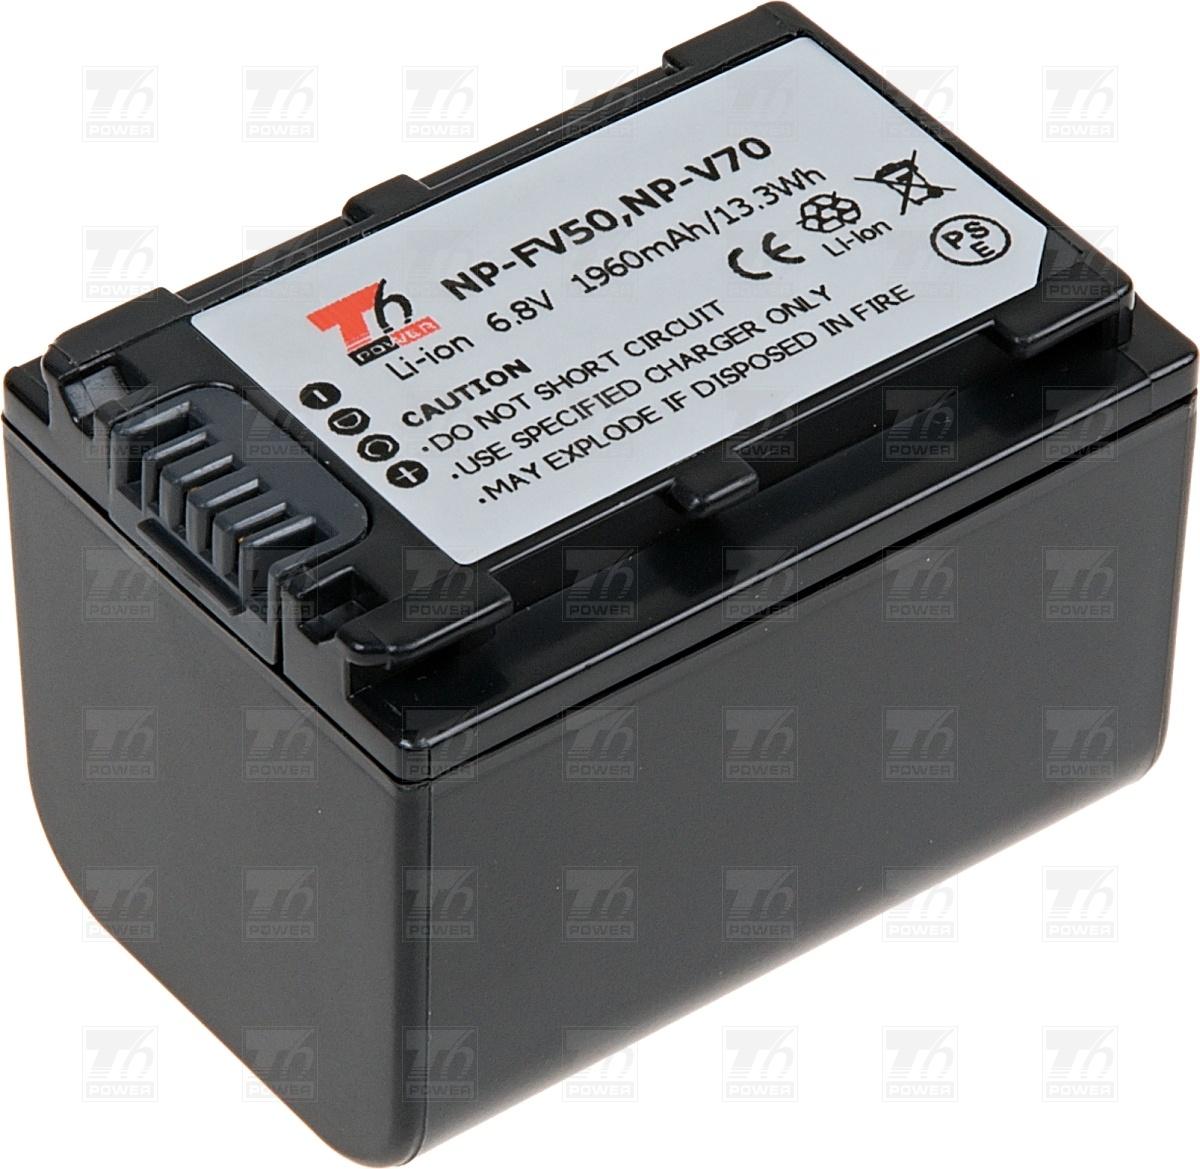 T6 power Baterie T6 power NP-FV70, NP-FV50, NP-FV30 VCSO0054